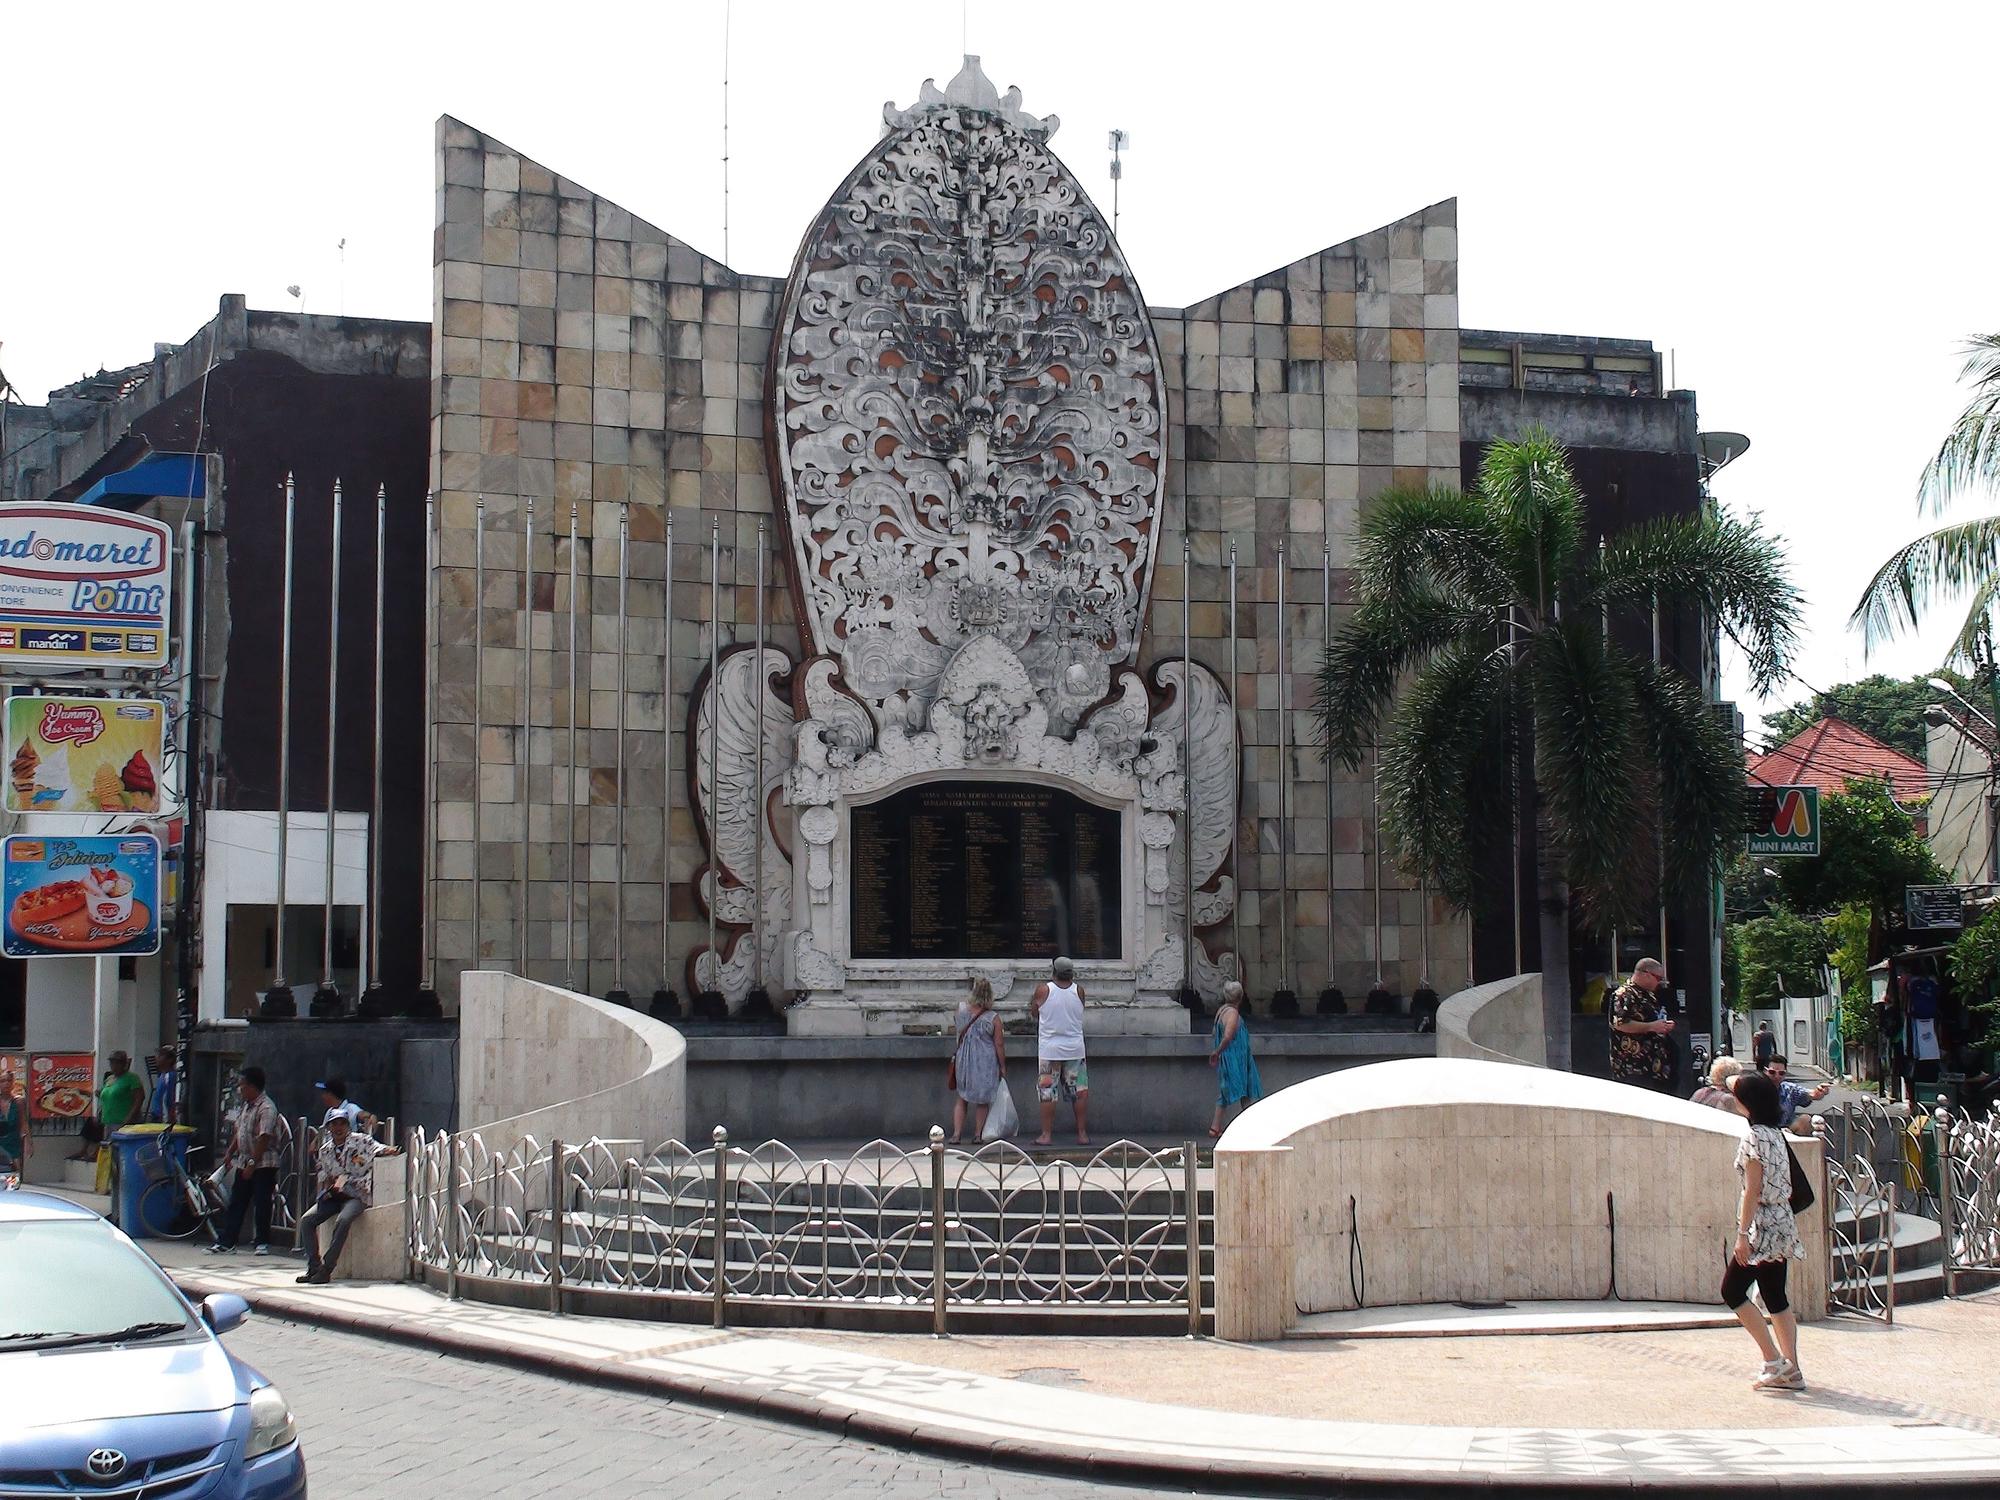 2002 Bali Bombing Memorial (Livinus/Getty Images)